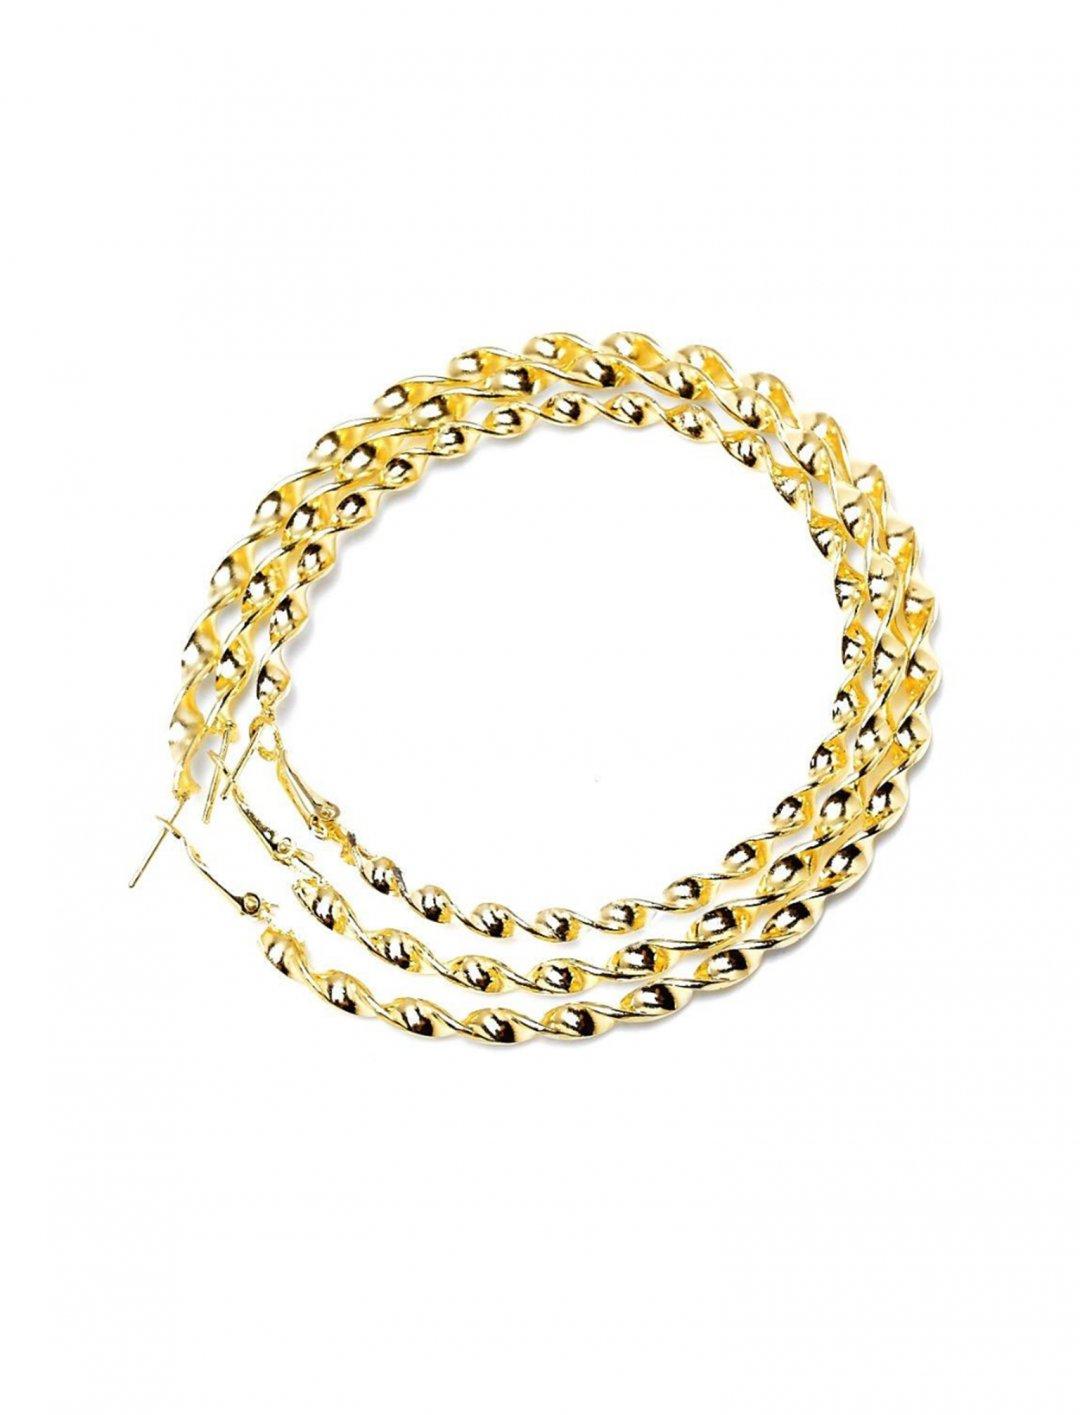 "Boohoo Hoop Earrings {""id"":10,""product_section_id"":1,""name"":""Jewellery"",""order"":10} Boohoo"